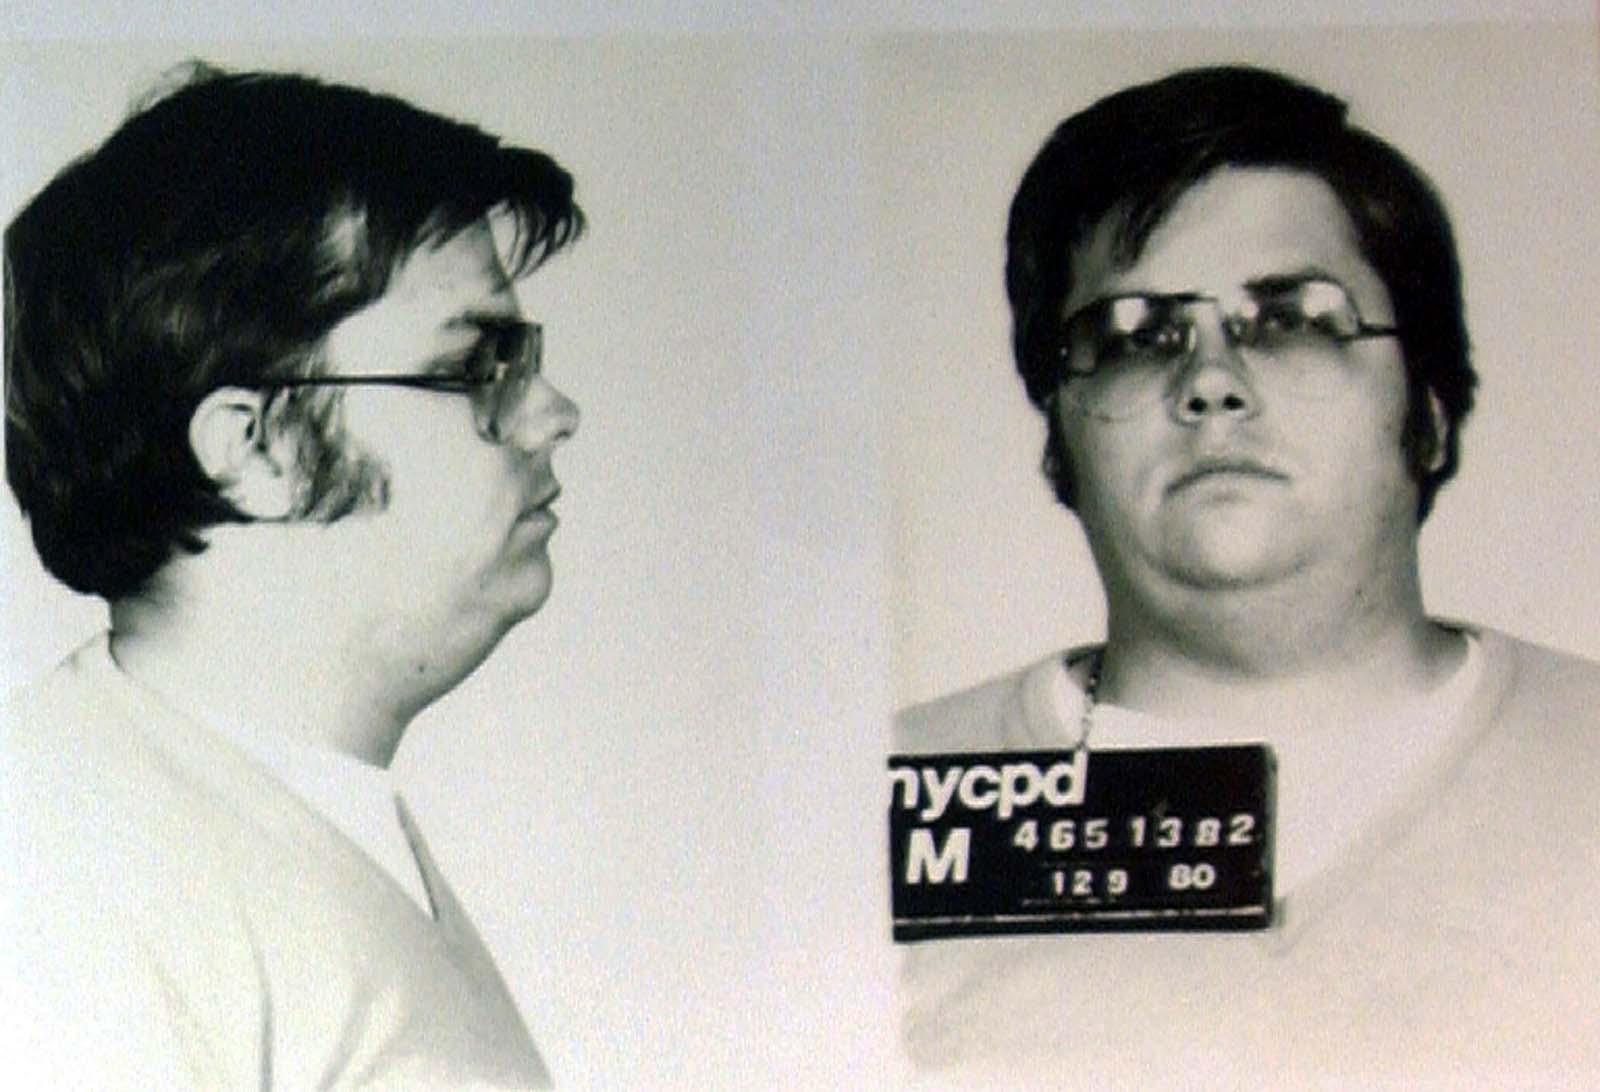 Mark Chapman's mugshot.